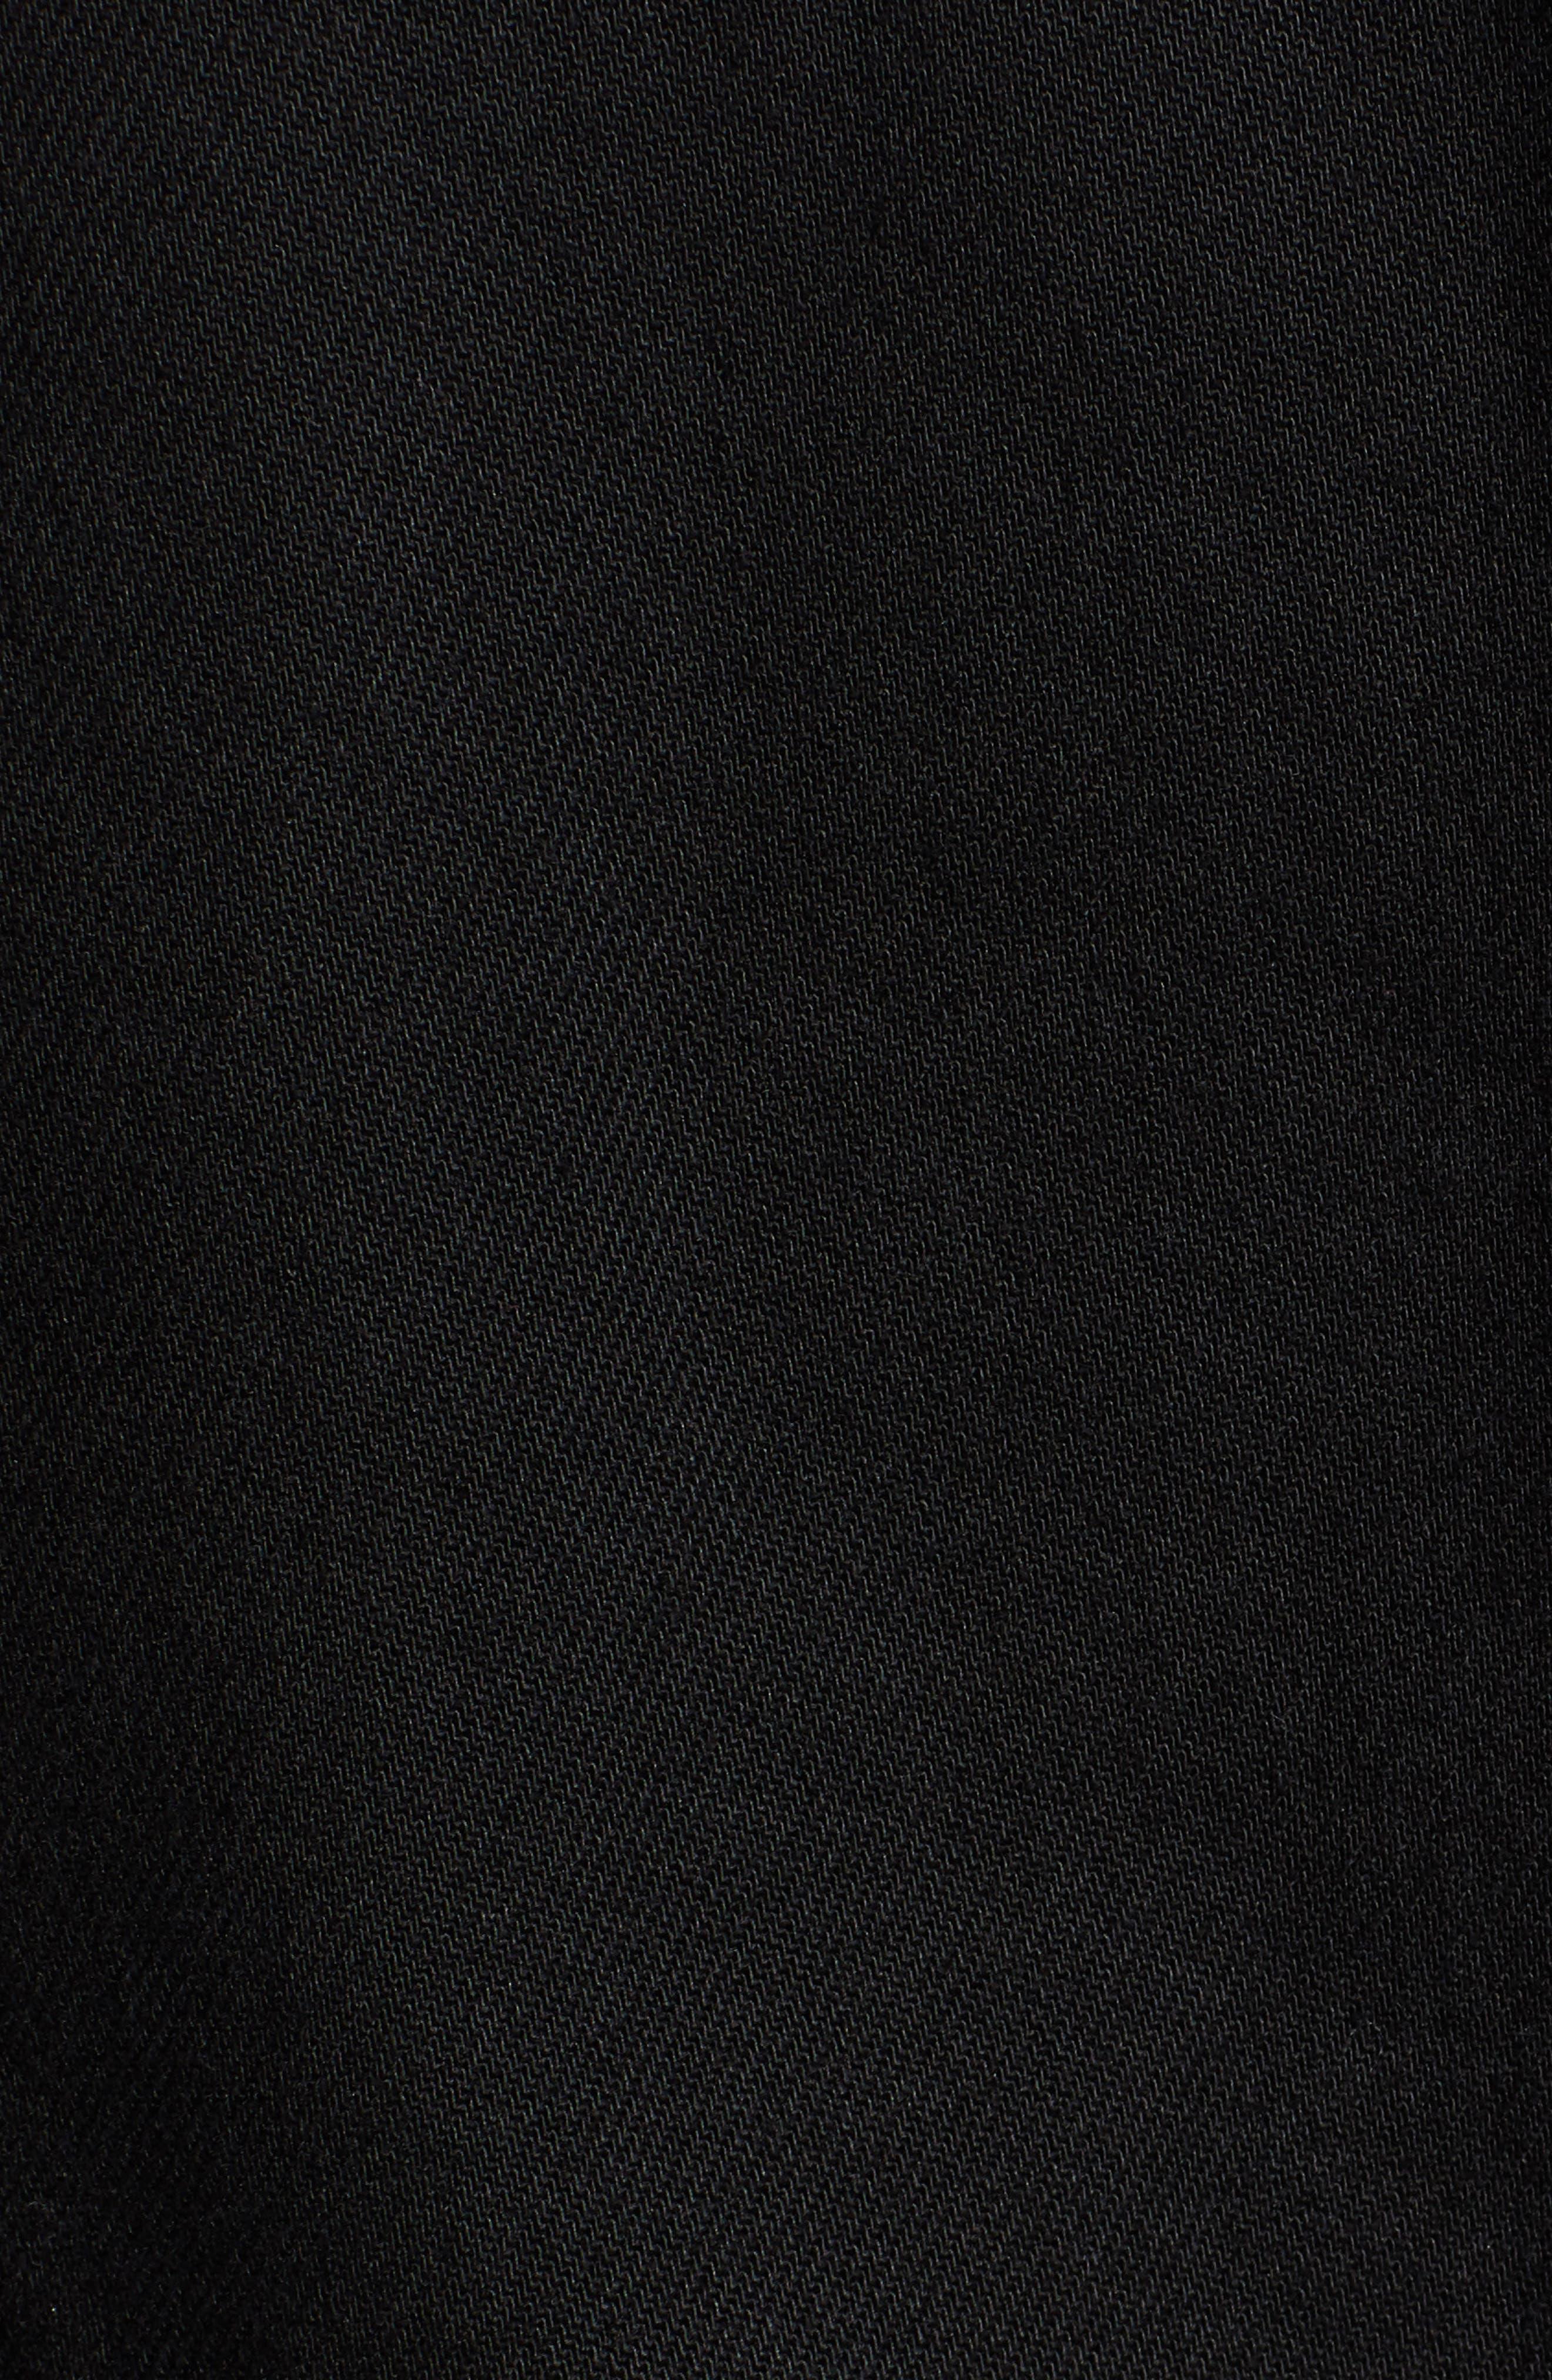 Lined Denim Trucker Jacket,                             Alternate thumbnail 7, color,                             BLACK SHERPA